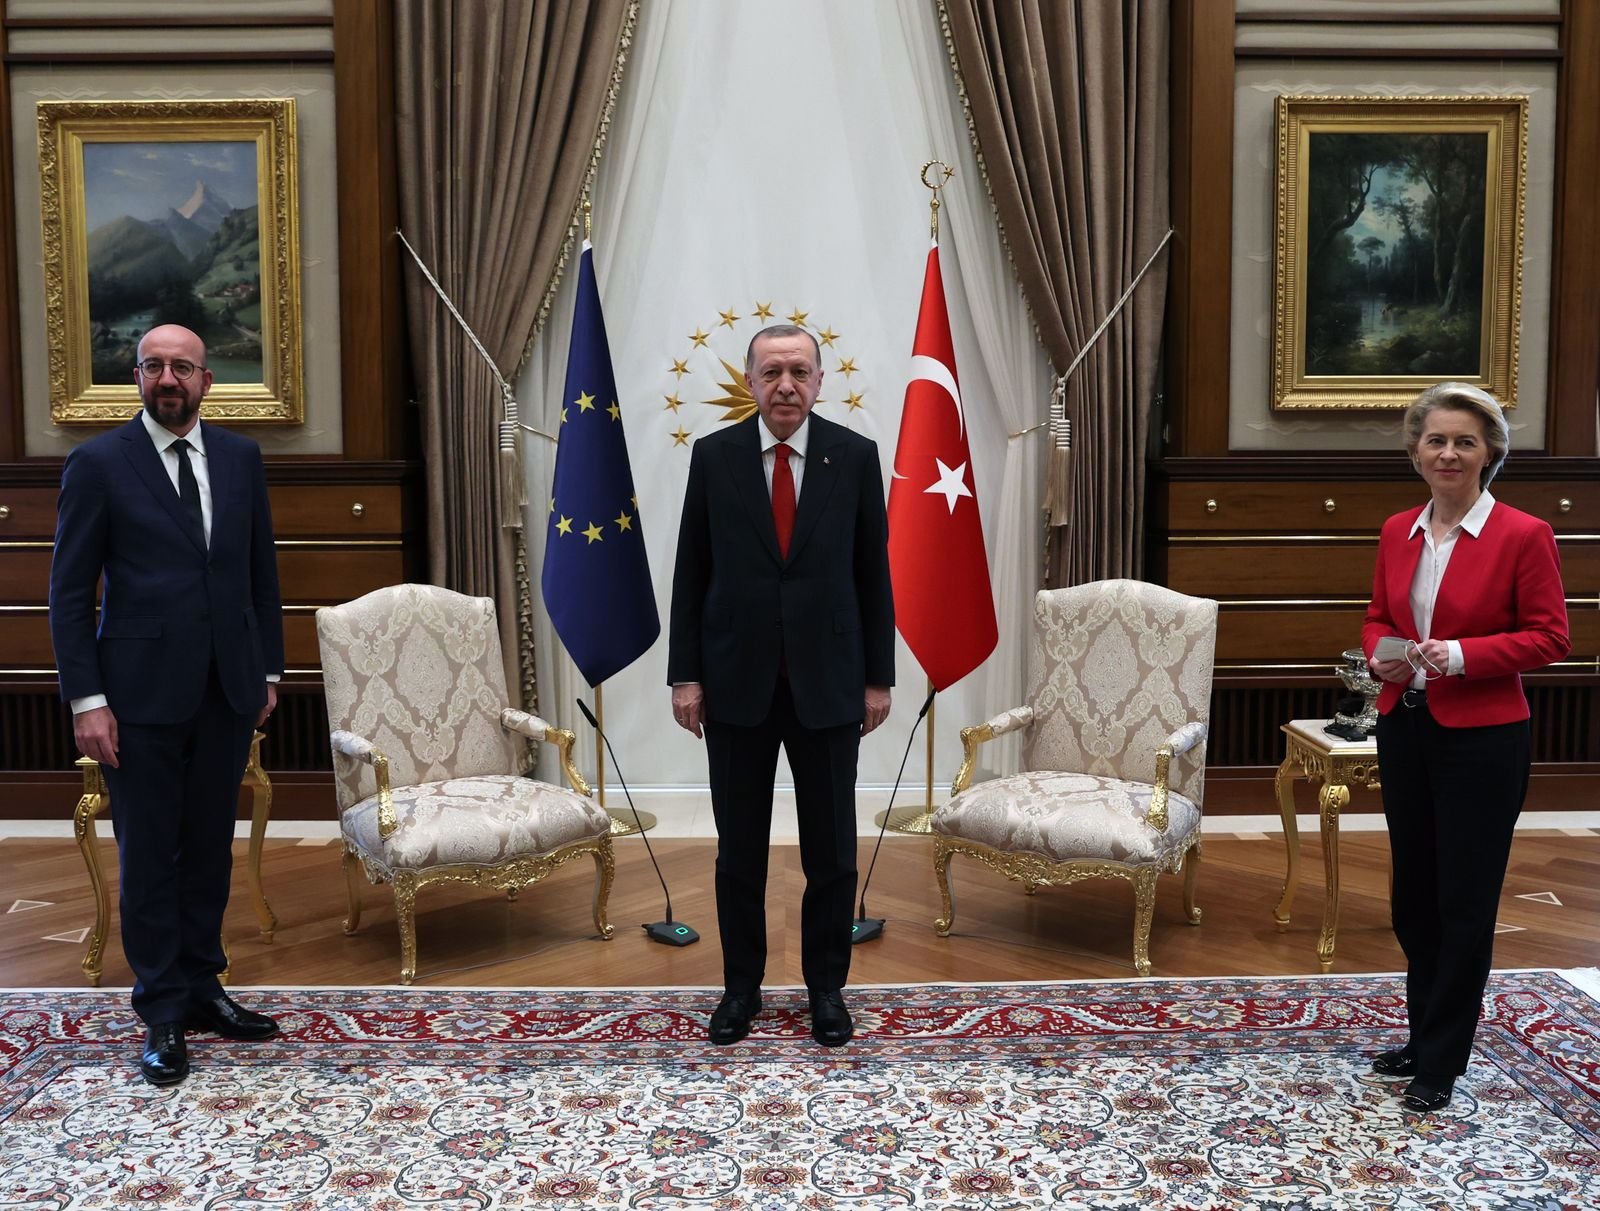 EU Council President Charles Michel and President of EU Commission Ursula Von der Leyen visit Turkey